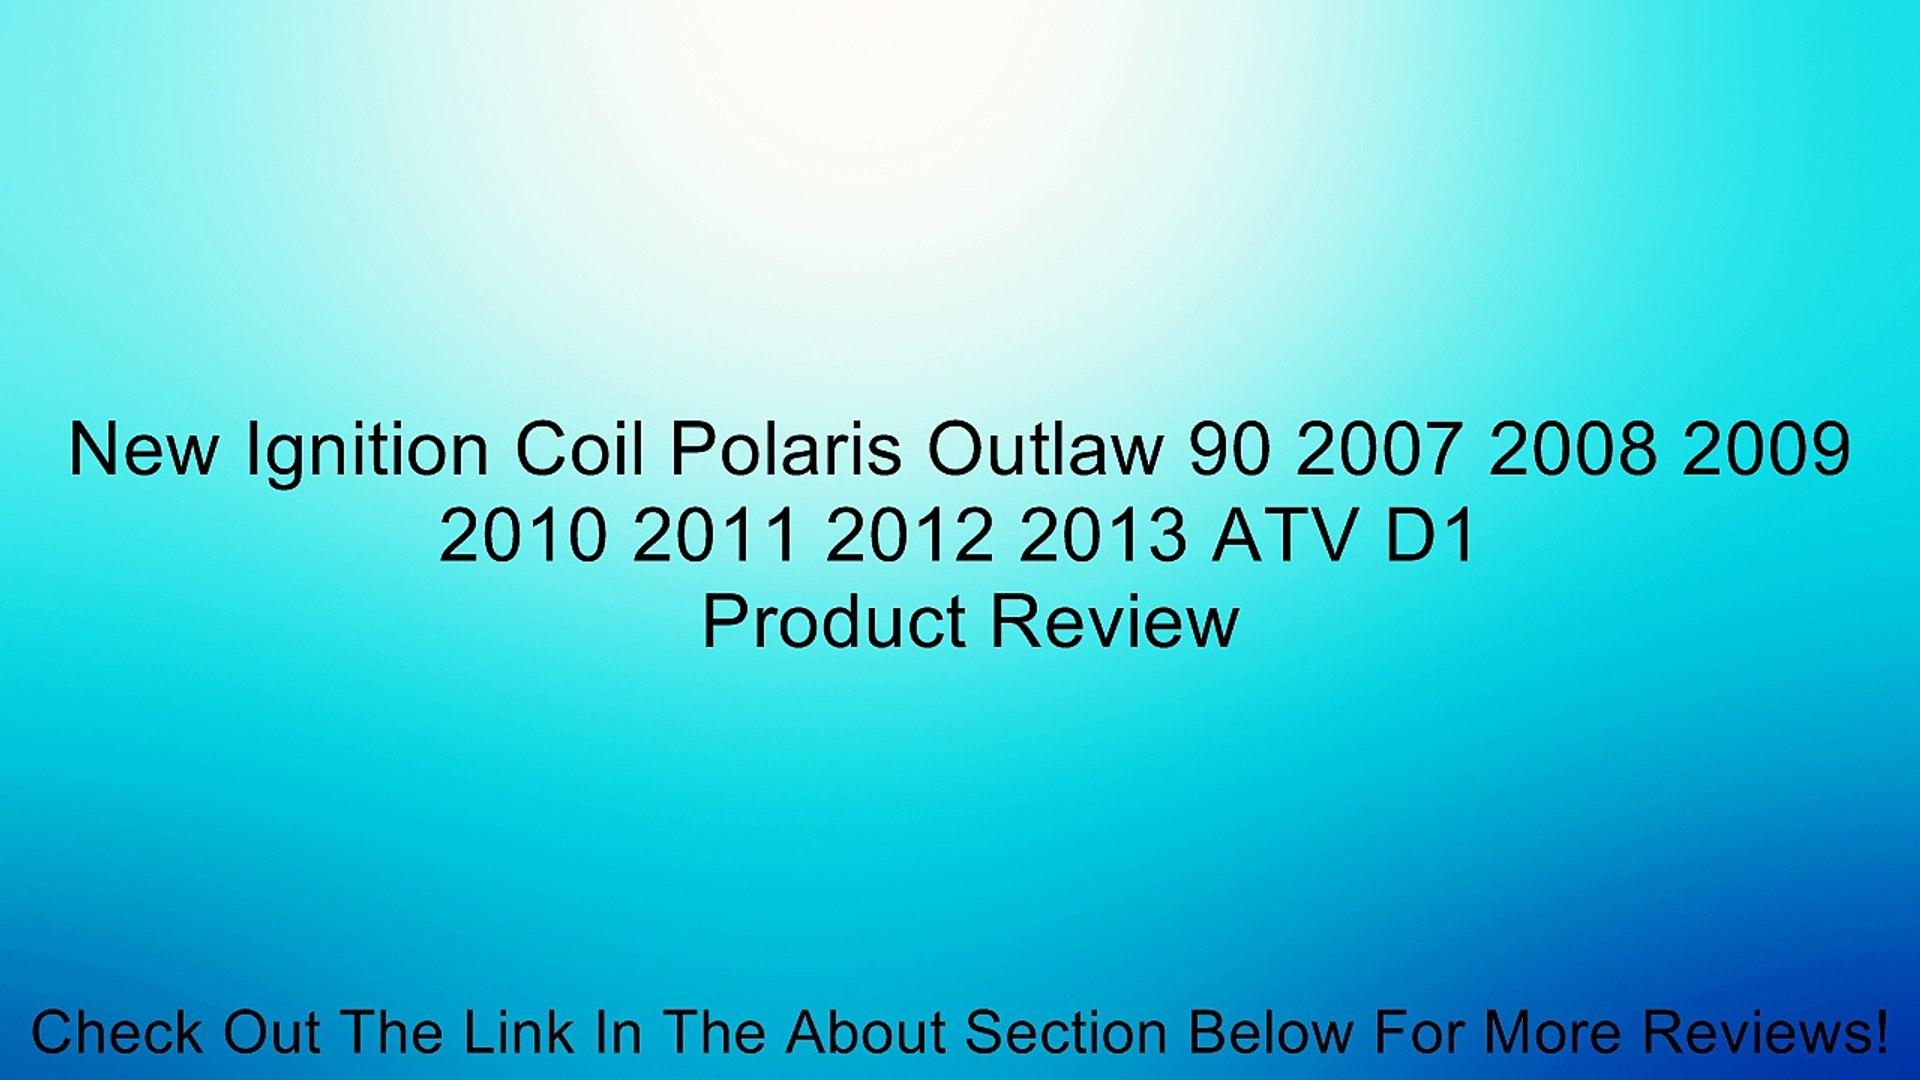 New Ignition Coil Polaris Outlaw 90 2007 2008 2009 2010 2011 2012 2013 ATV D1